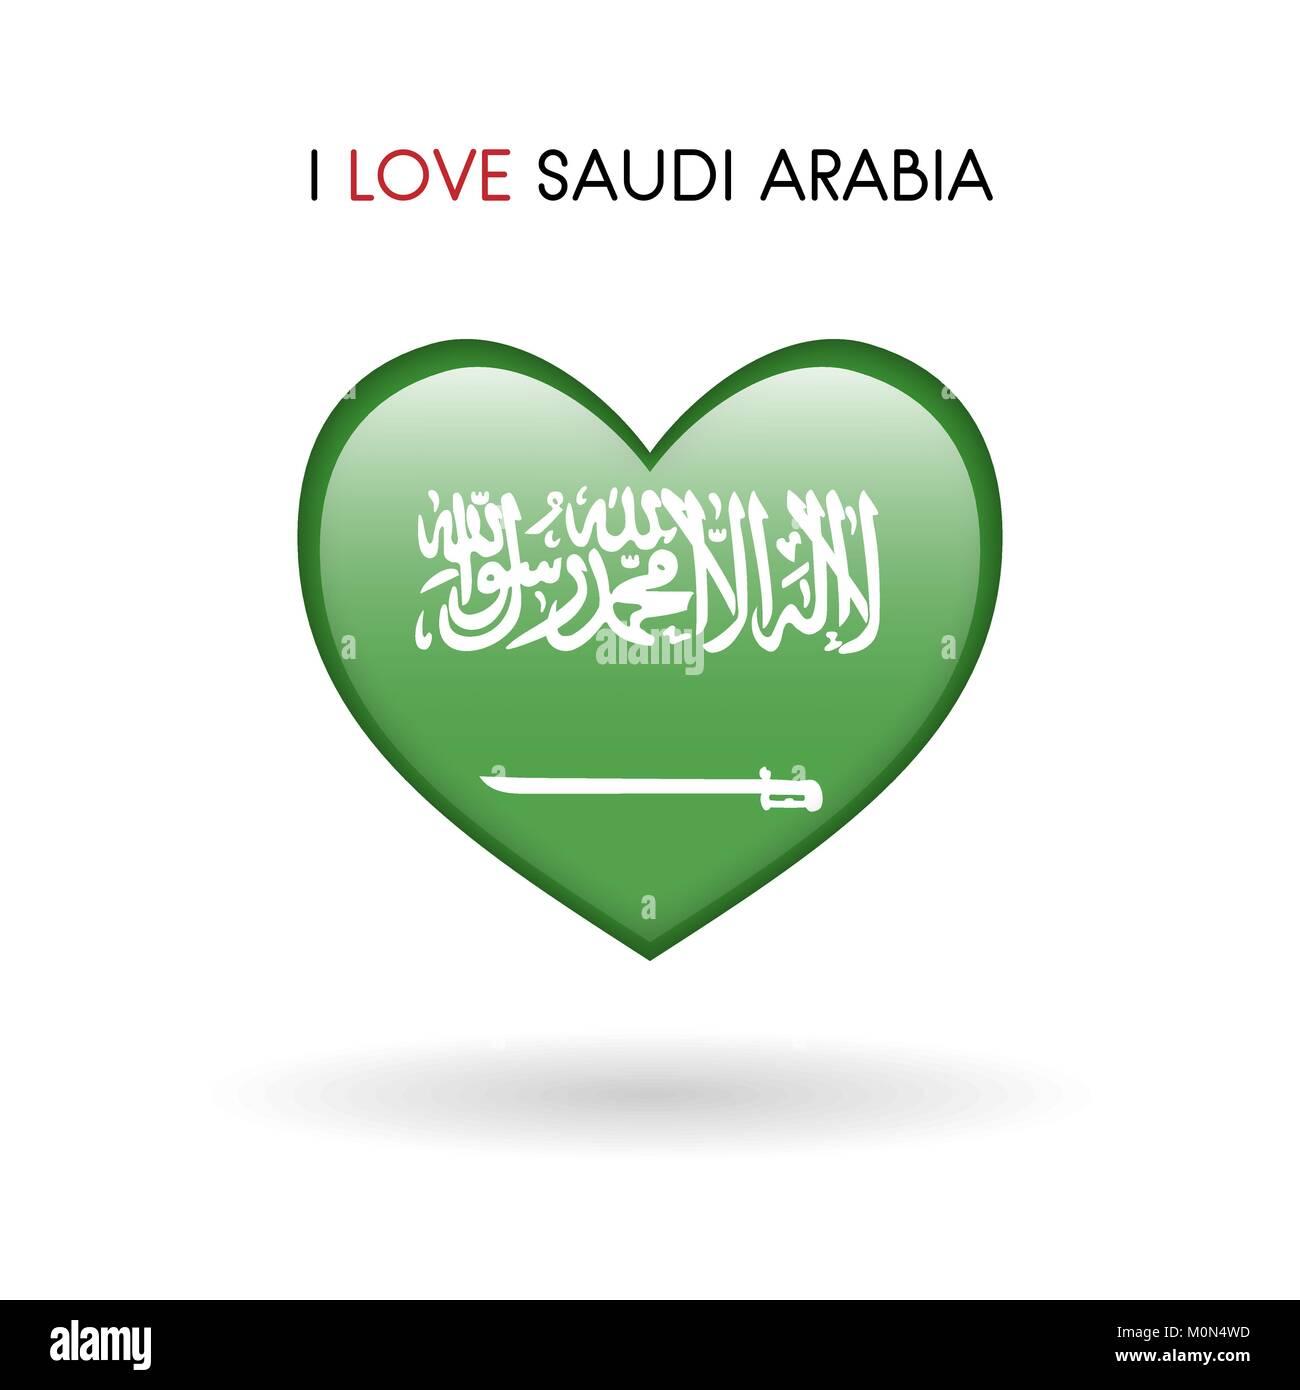 Love Saudi Arabia symbol. Flag Heart Glossy icon vector illustration isolated on gray background eps10 - Stock Image